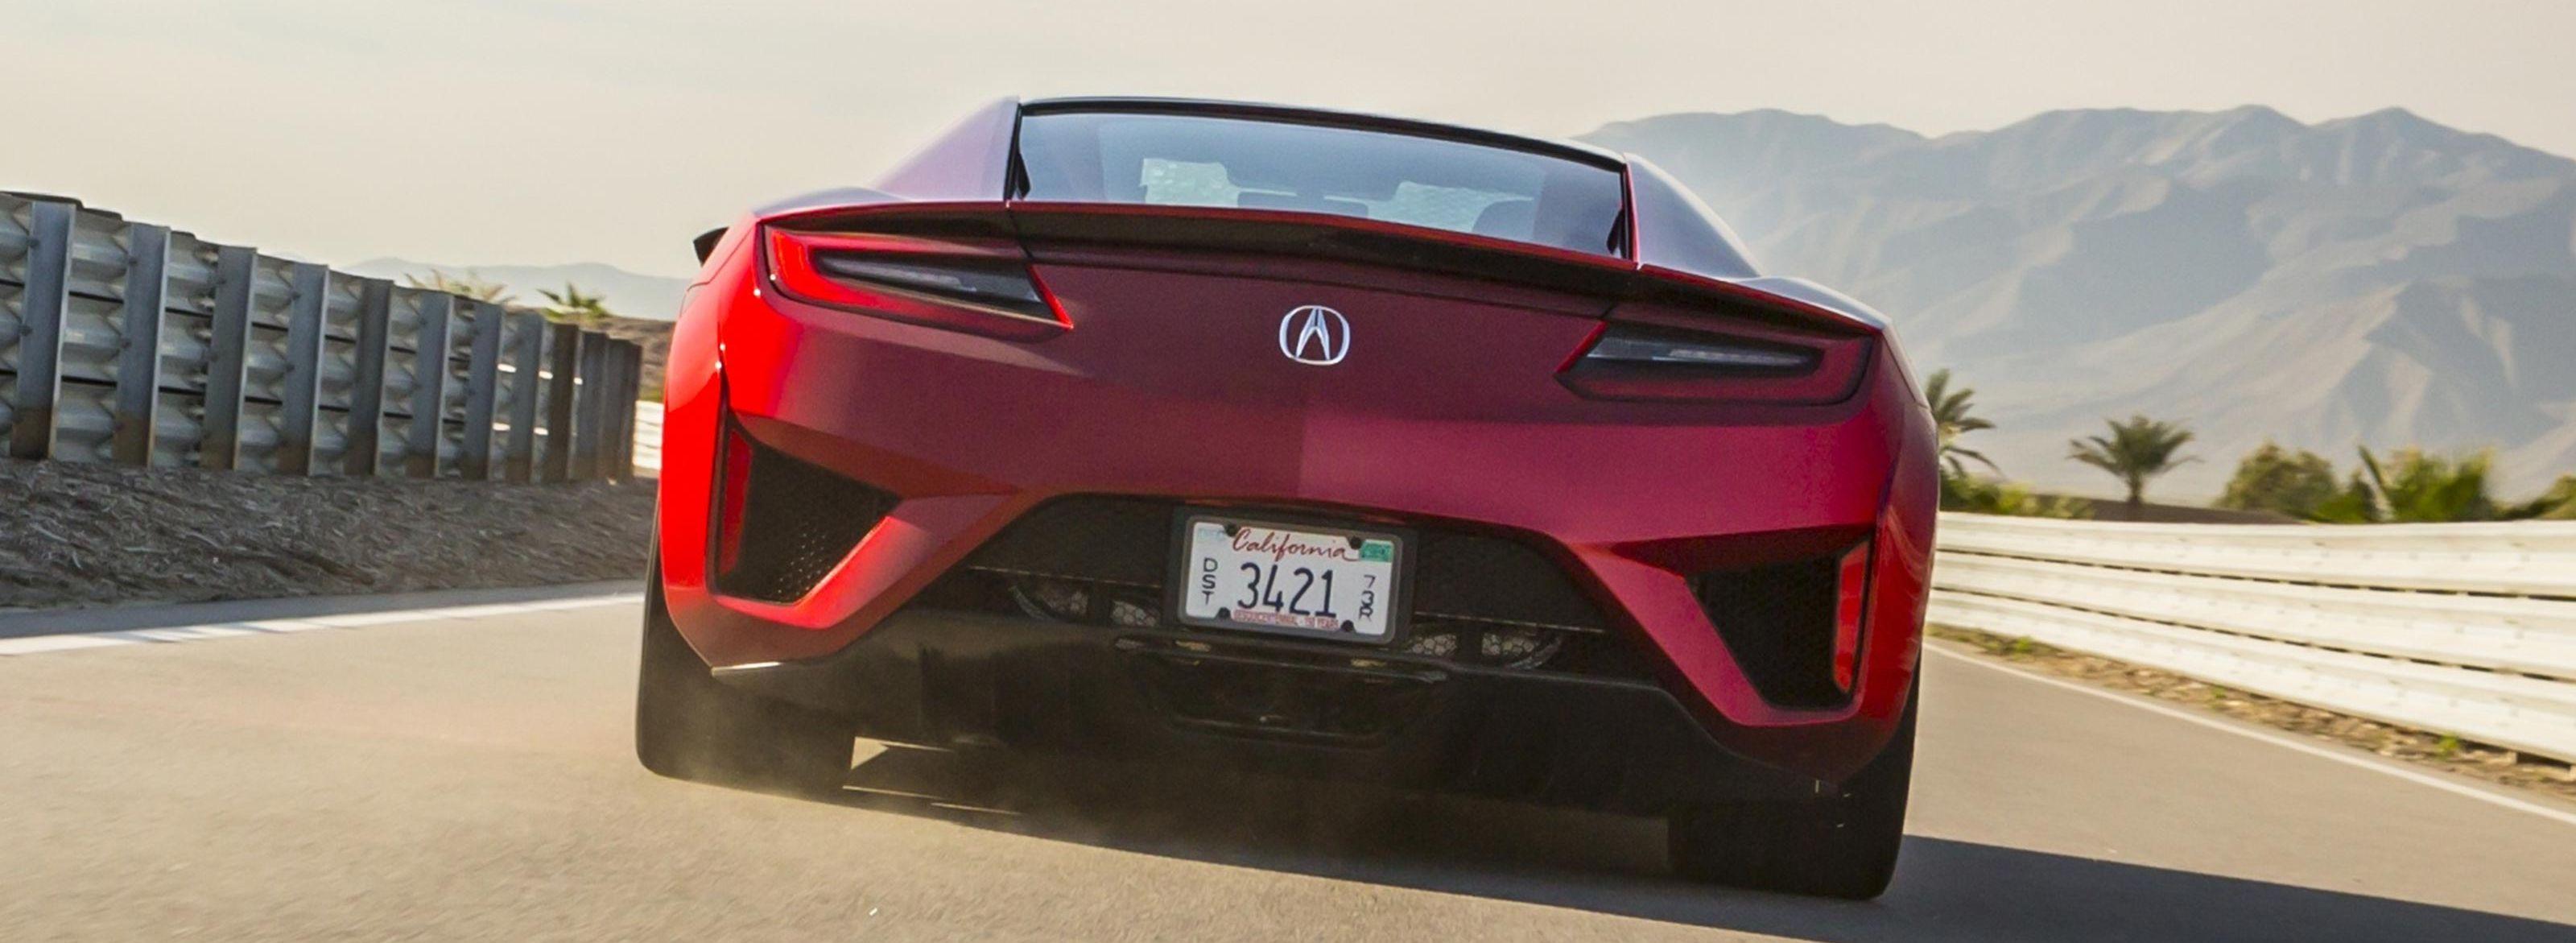 2017 Acura NSX for Sale near Washington DC Pohanka Automotive Group